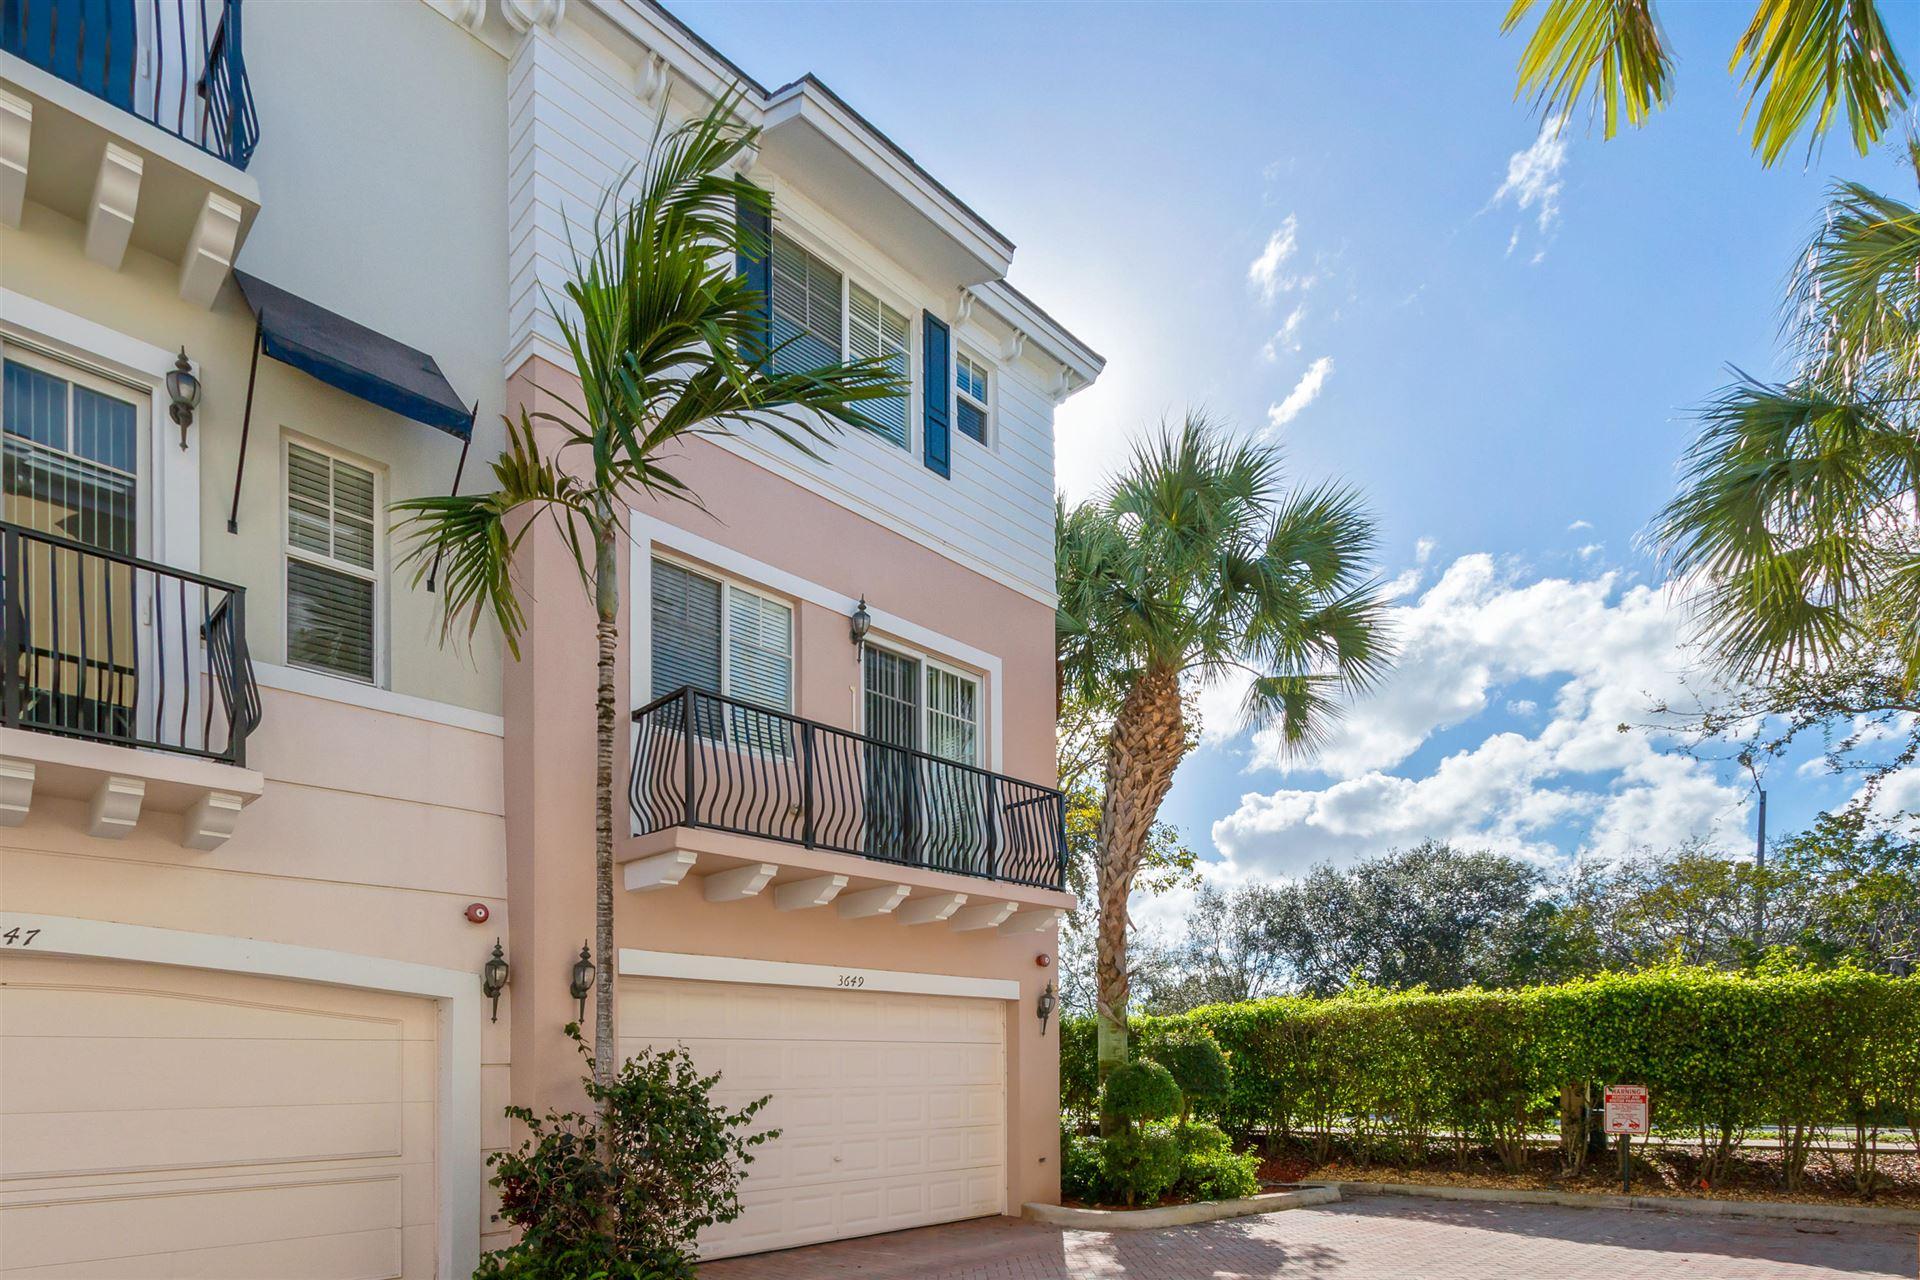 3649 NW 5th Terrace, Boca Raton, FL 33431 - #: RX-10637241